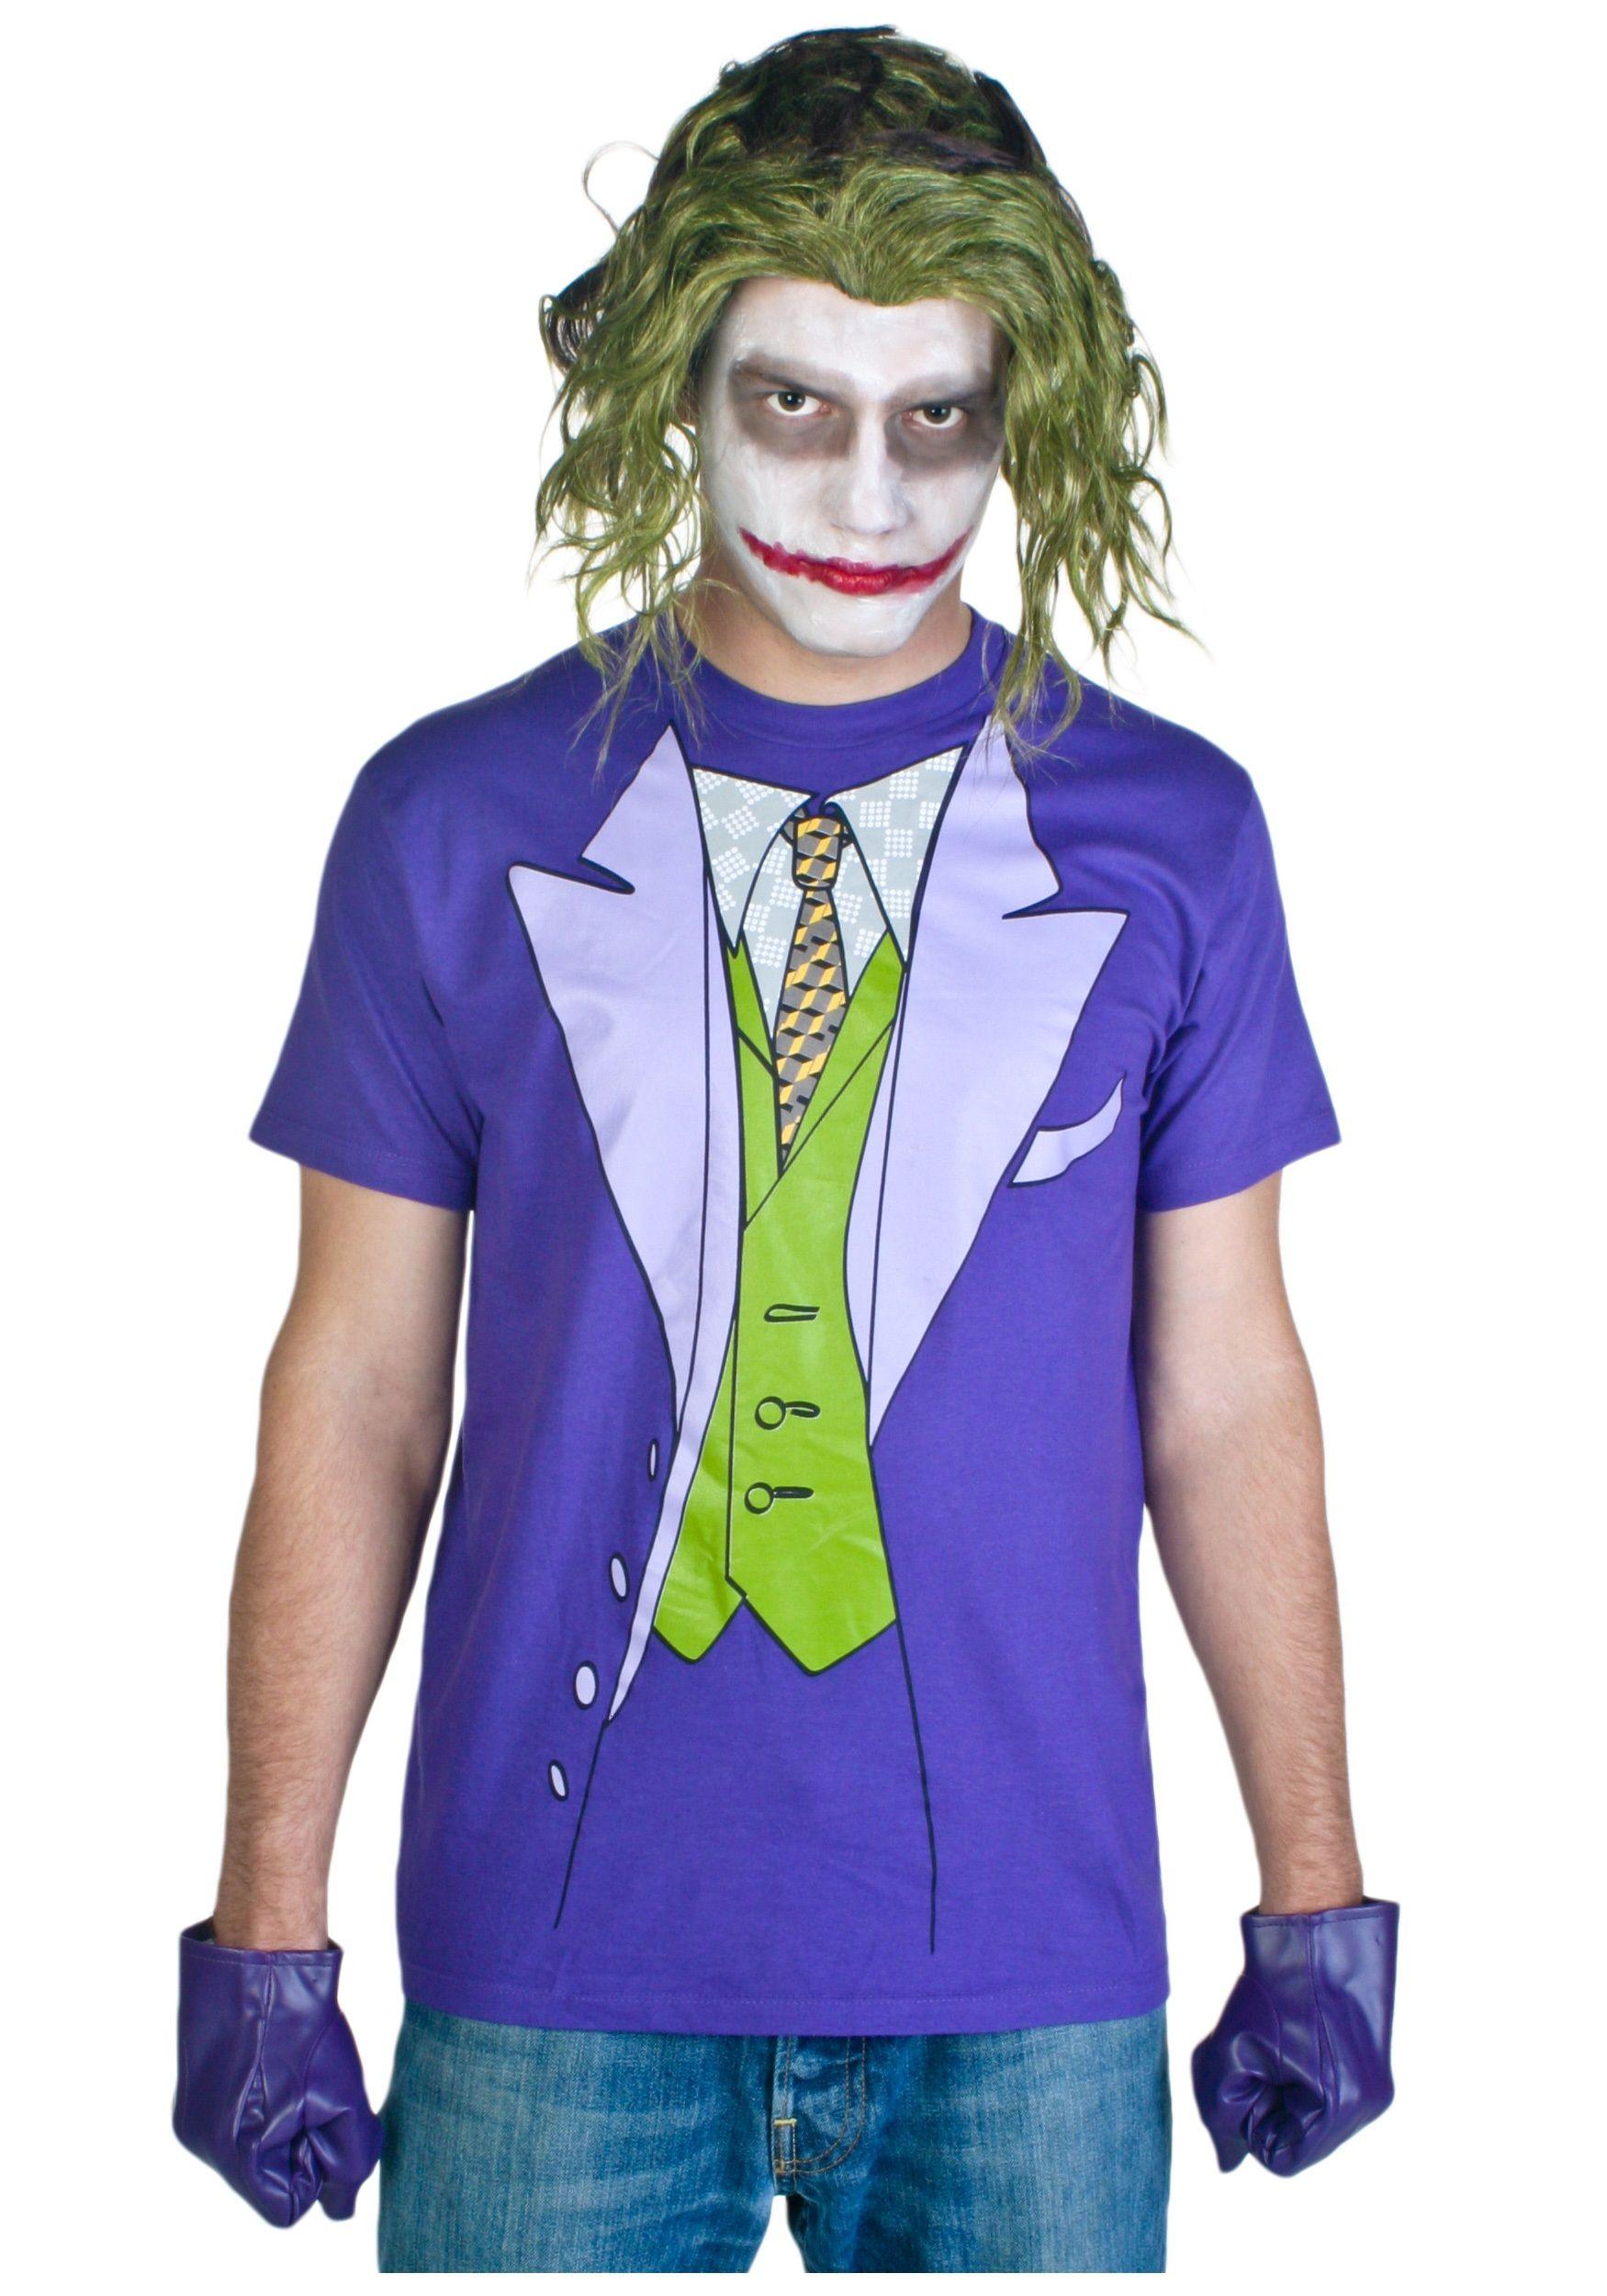 Mens joker costume t shirt dorky like me pinterest joker mens joker costume t shirt solutioingenieria Choice Image